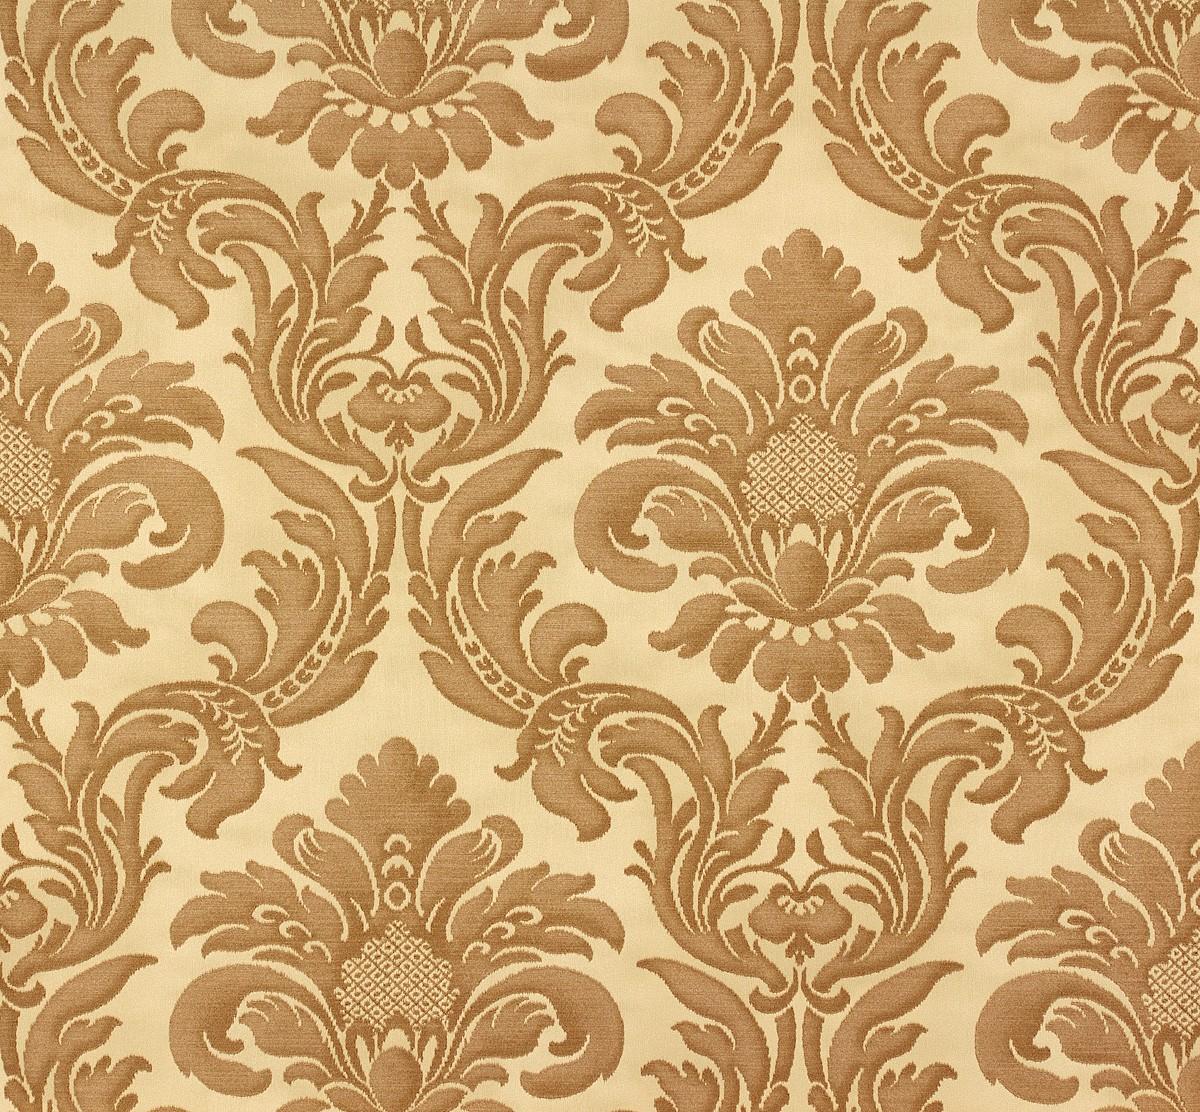 vliestapete rasch trianon barock beige gold 515060. Black Bedroom Furniture Sets. Home Design Ideas